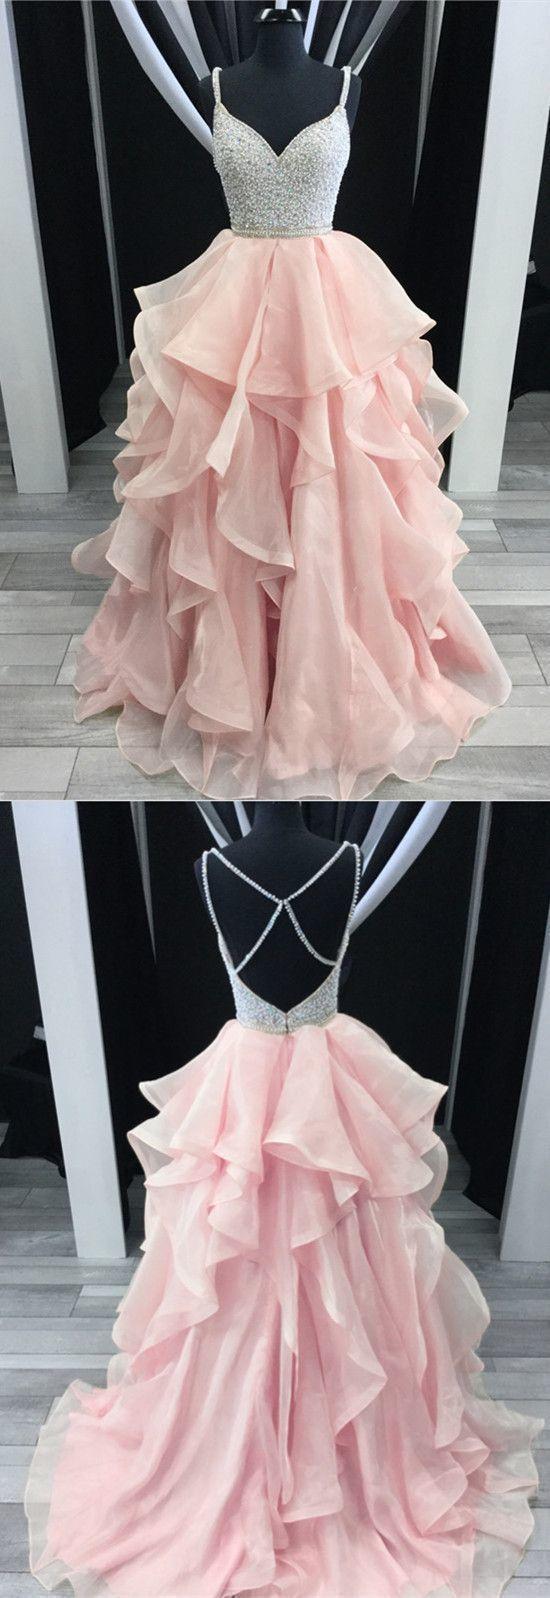 Discount Fancy Open Back Prom Dresses, Hübsche Prom Dresses, Günstige Prom Dresses, ... #discount #dresses #fancy #gunstige #hubsche #promdresseslong